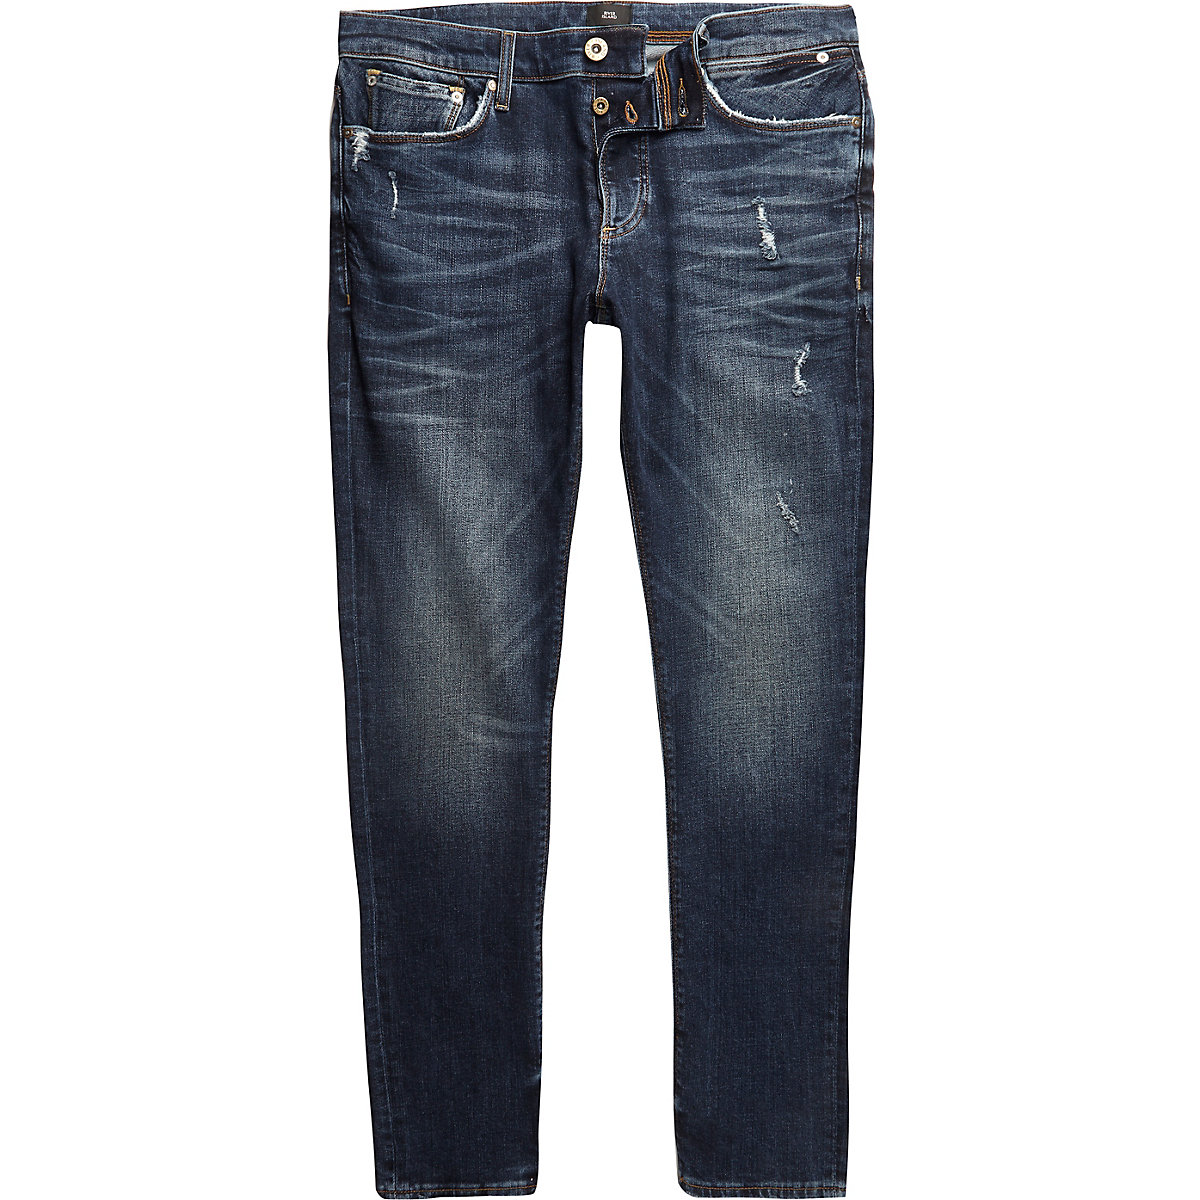 Dark blue wash distressed Sid skinny jeans